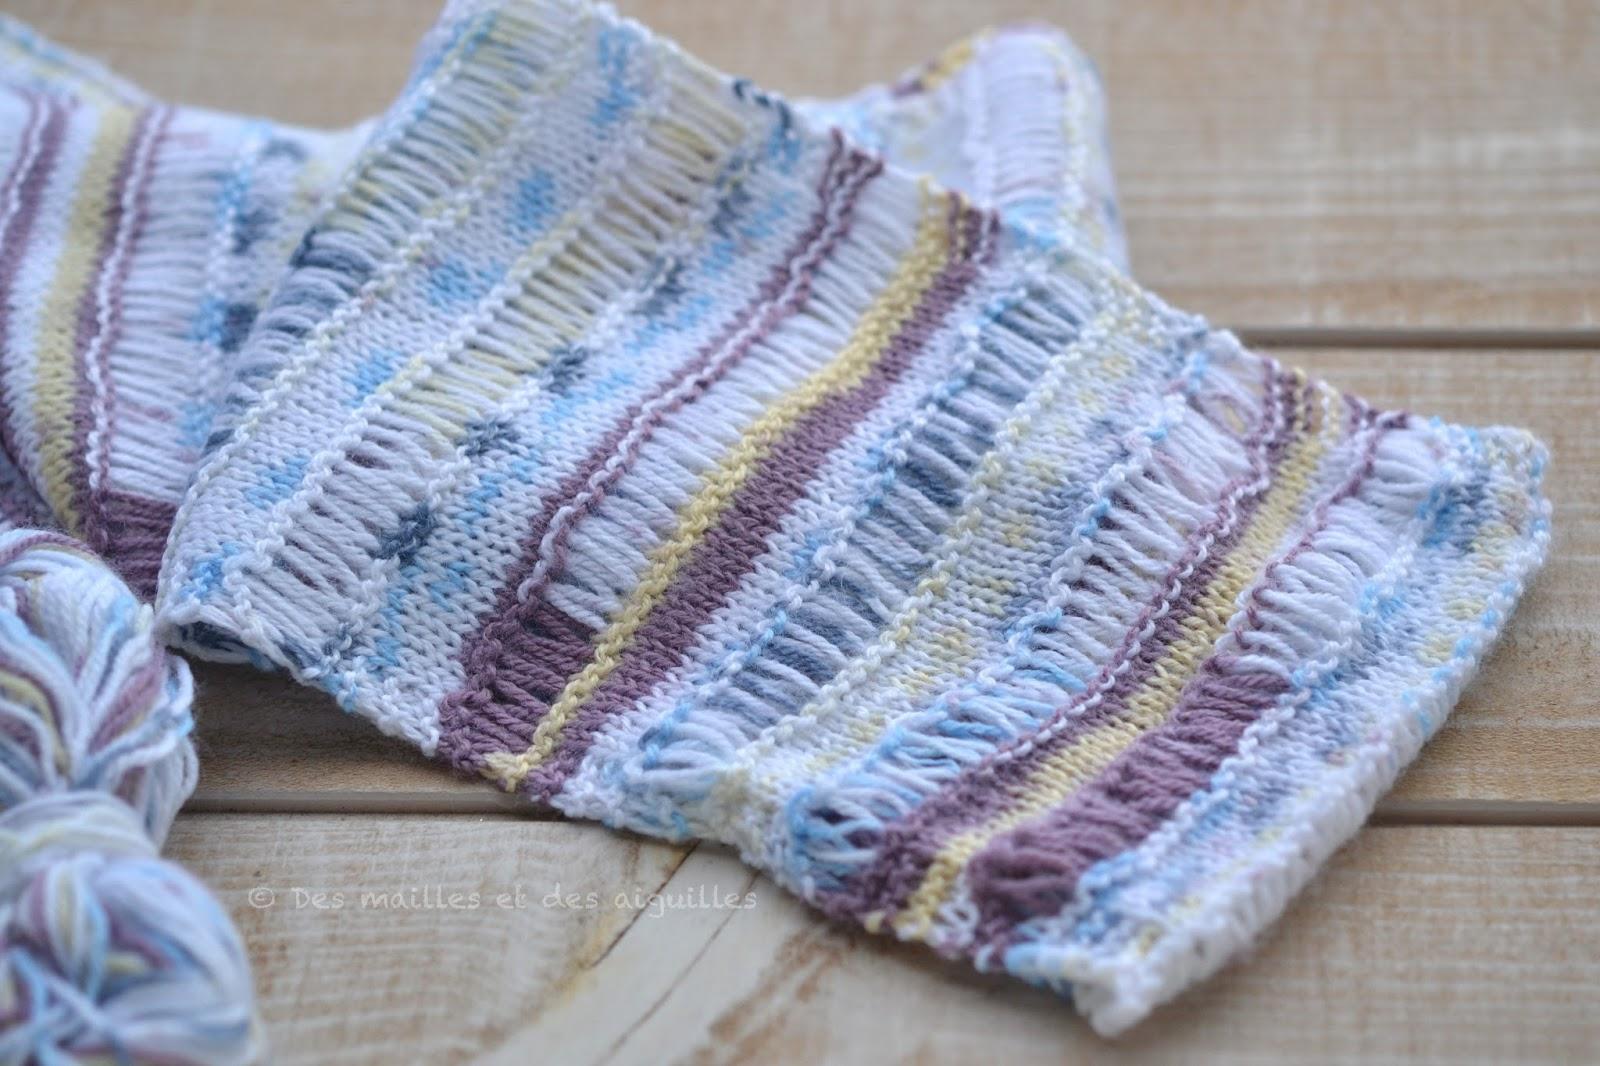 tricoter 4 mailles dans 1 maille